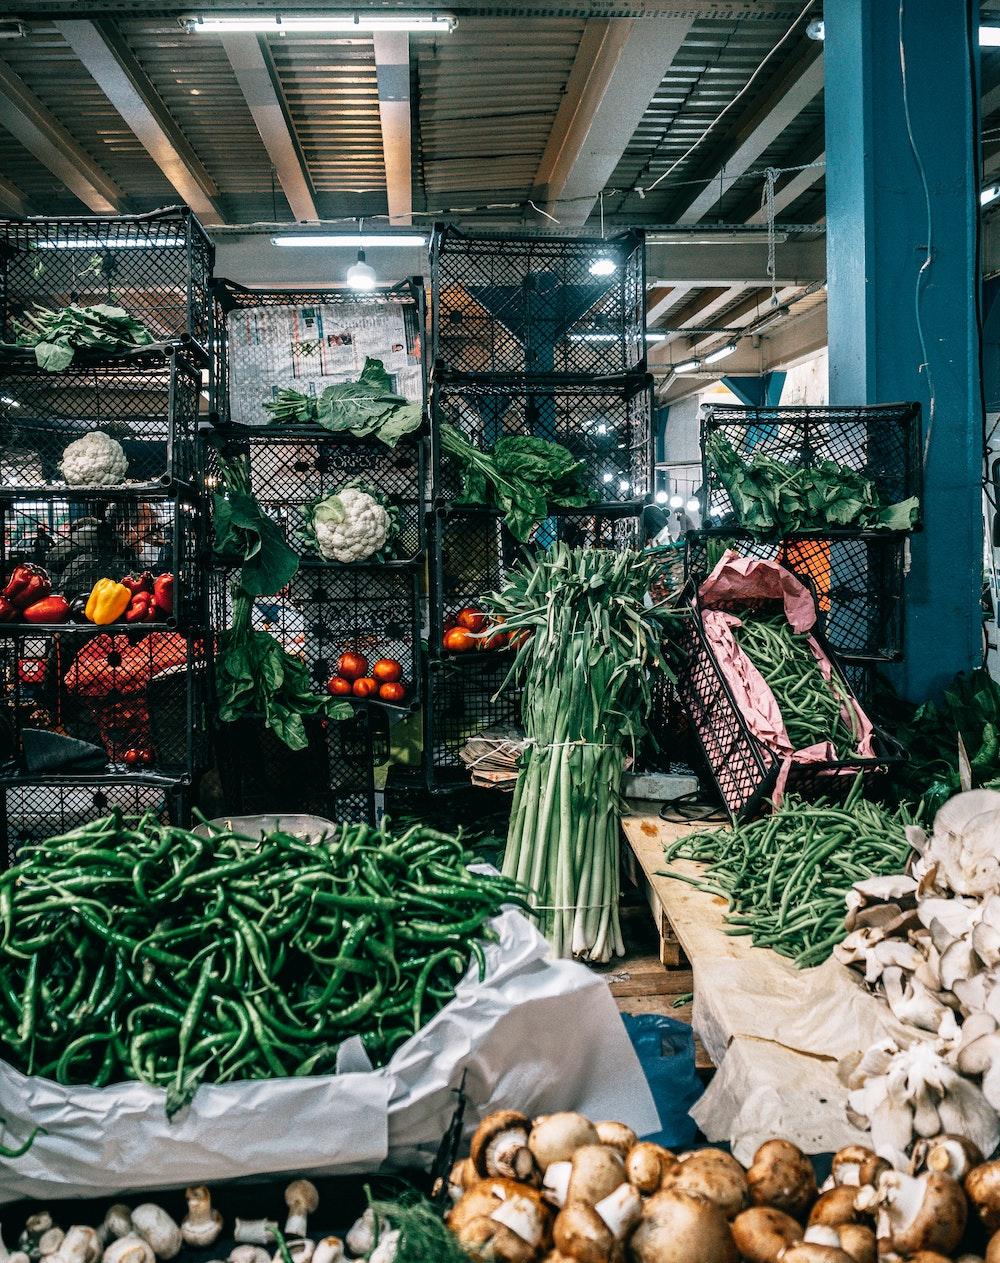 Foto: verpackungsloser Supermarkt